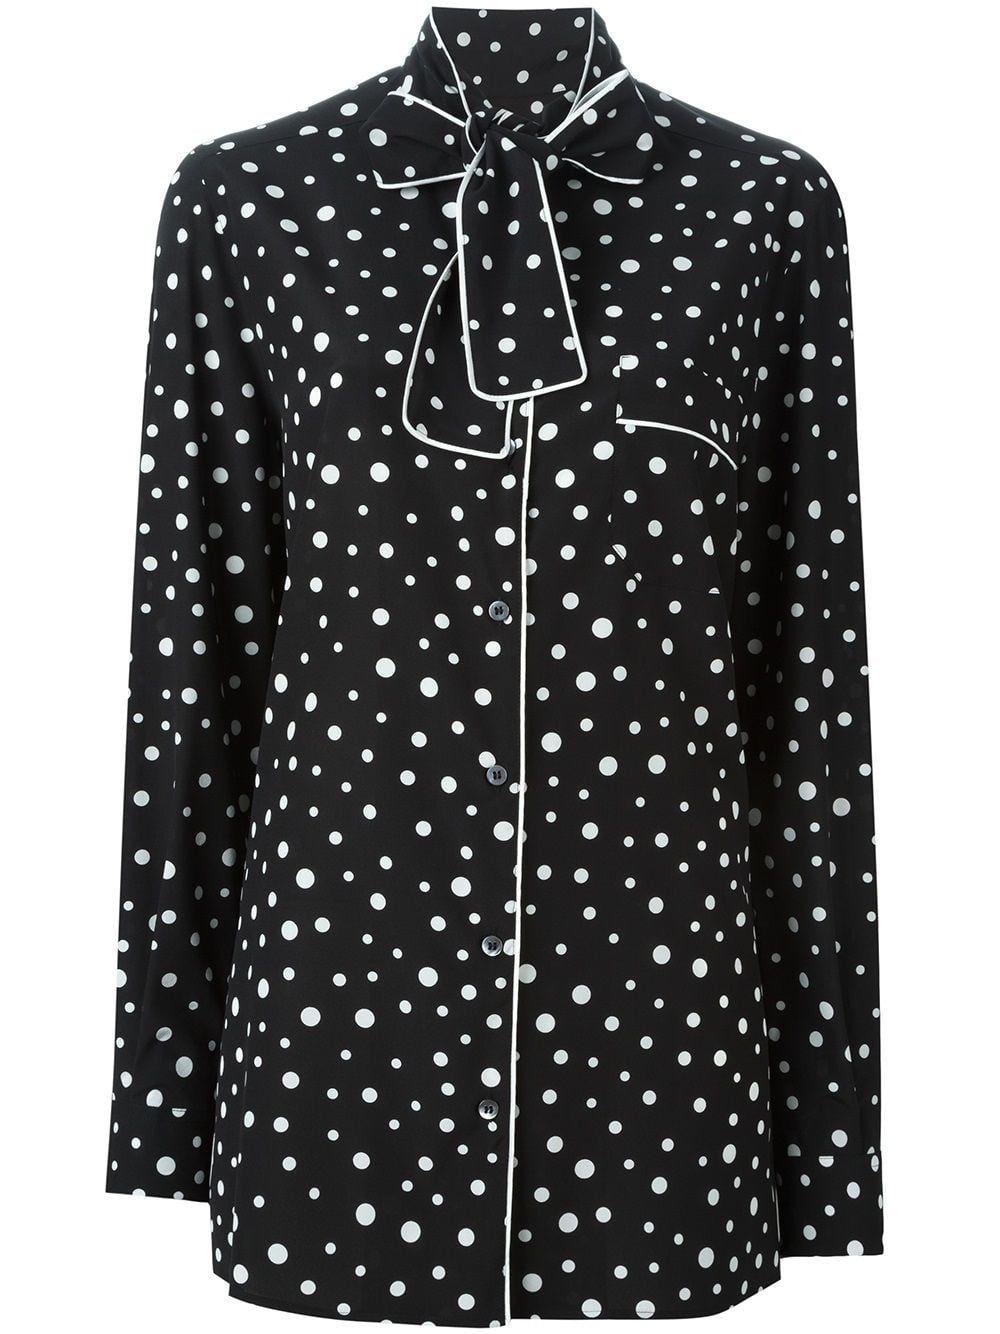 449a4f9d0f Dolce & Gabbana polka dot print pyjama shirt - Black | Products in ...